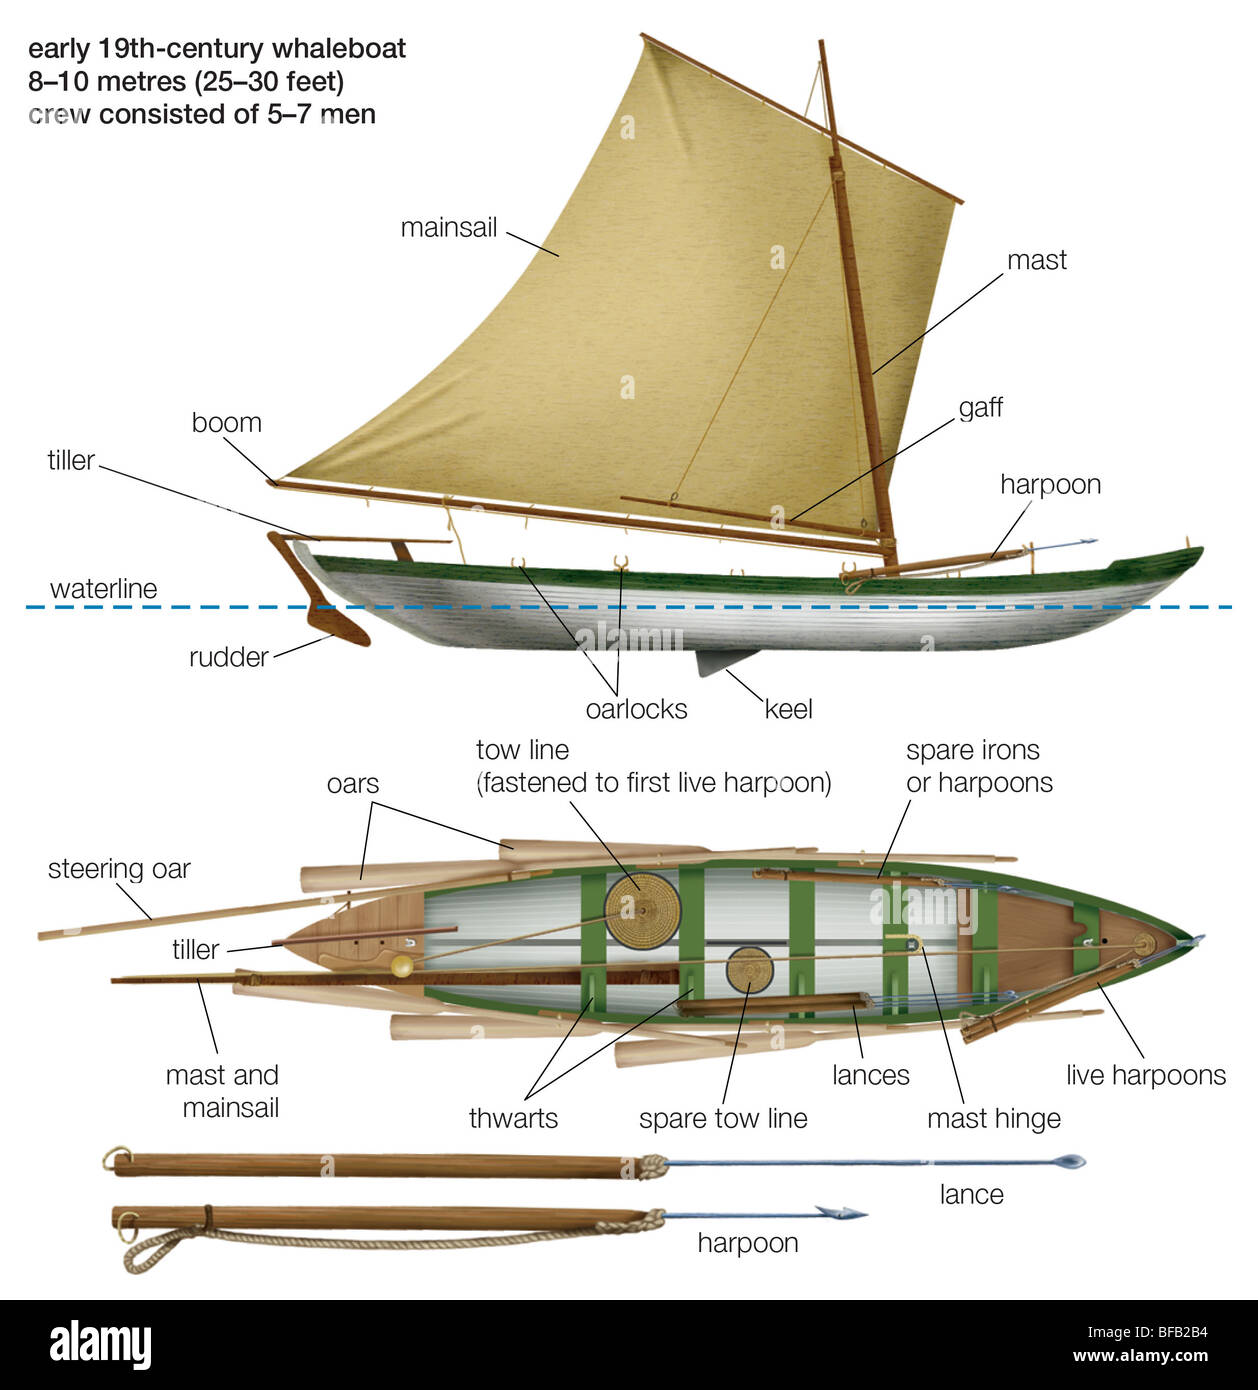 A principios del siglo xix whaleboat Imagen De Stock